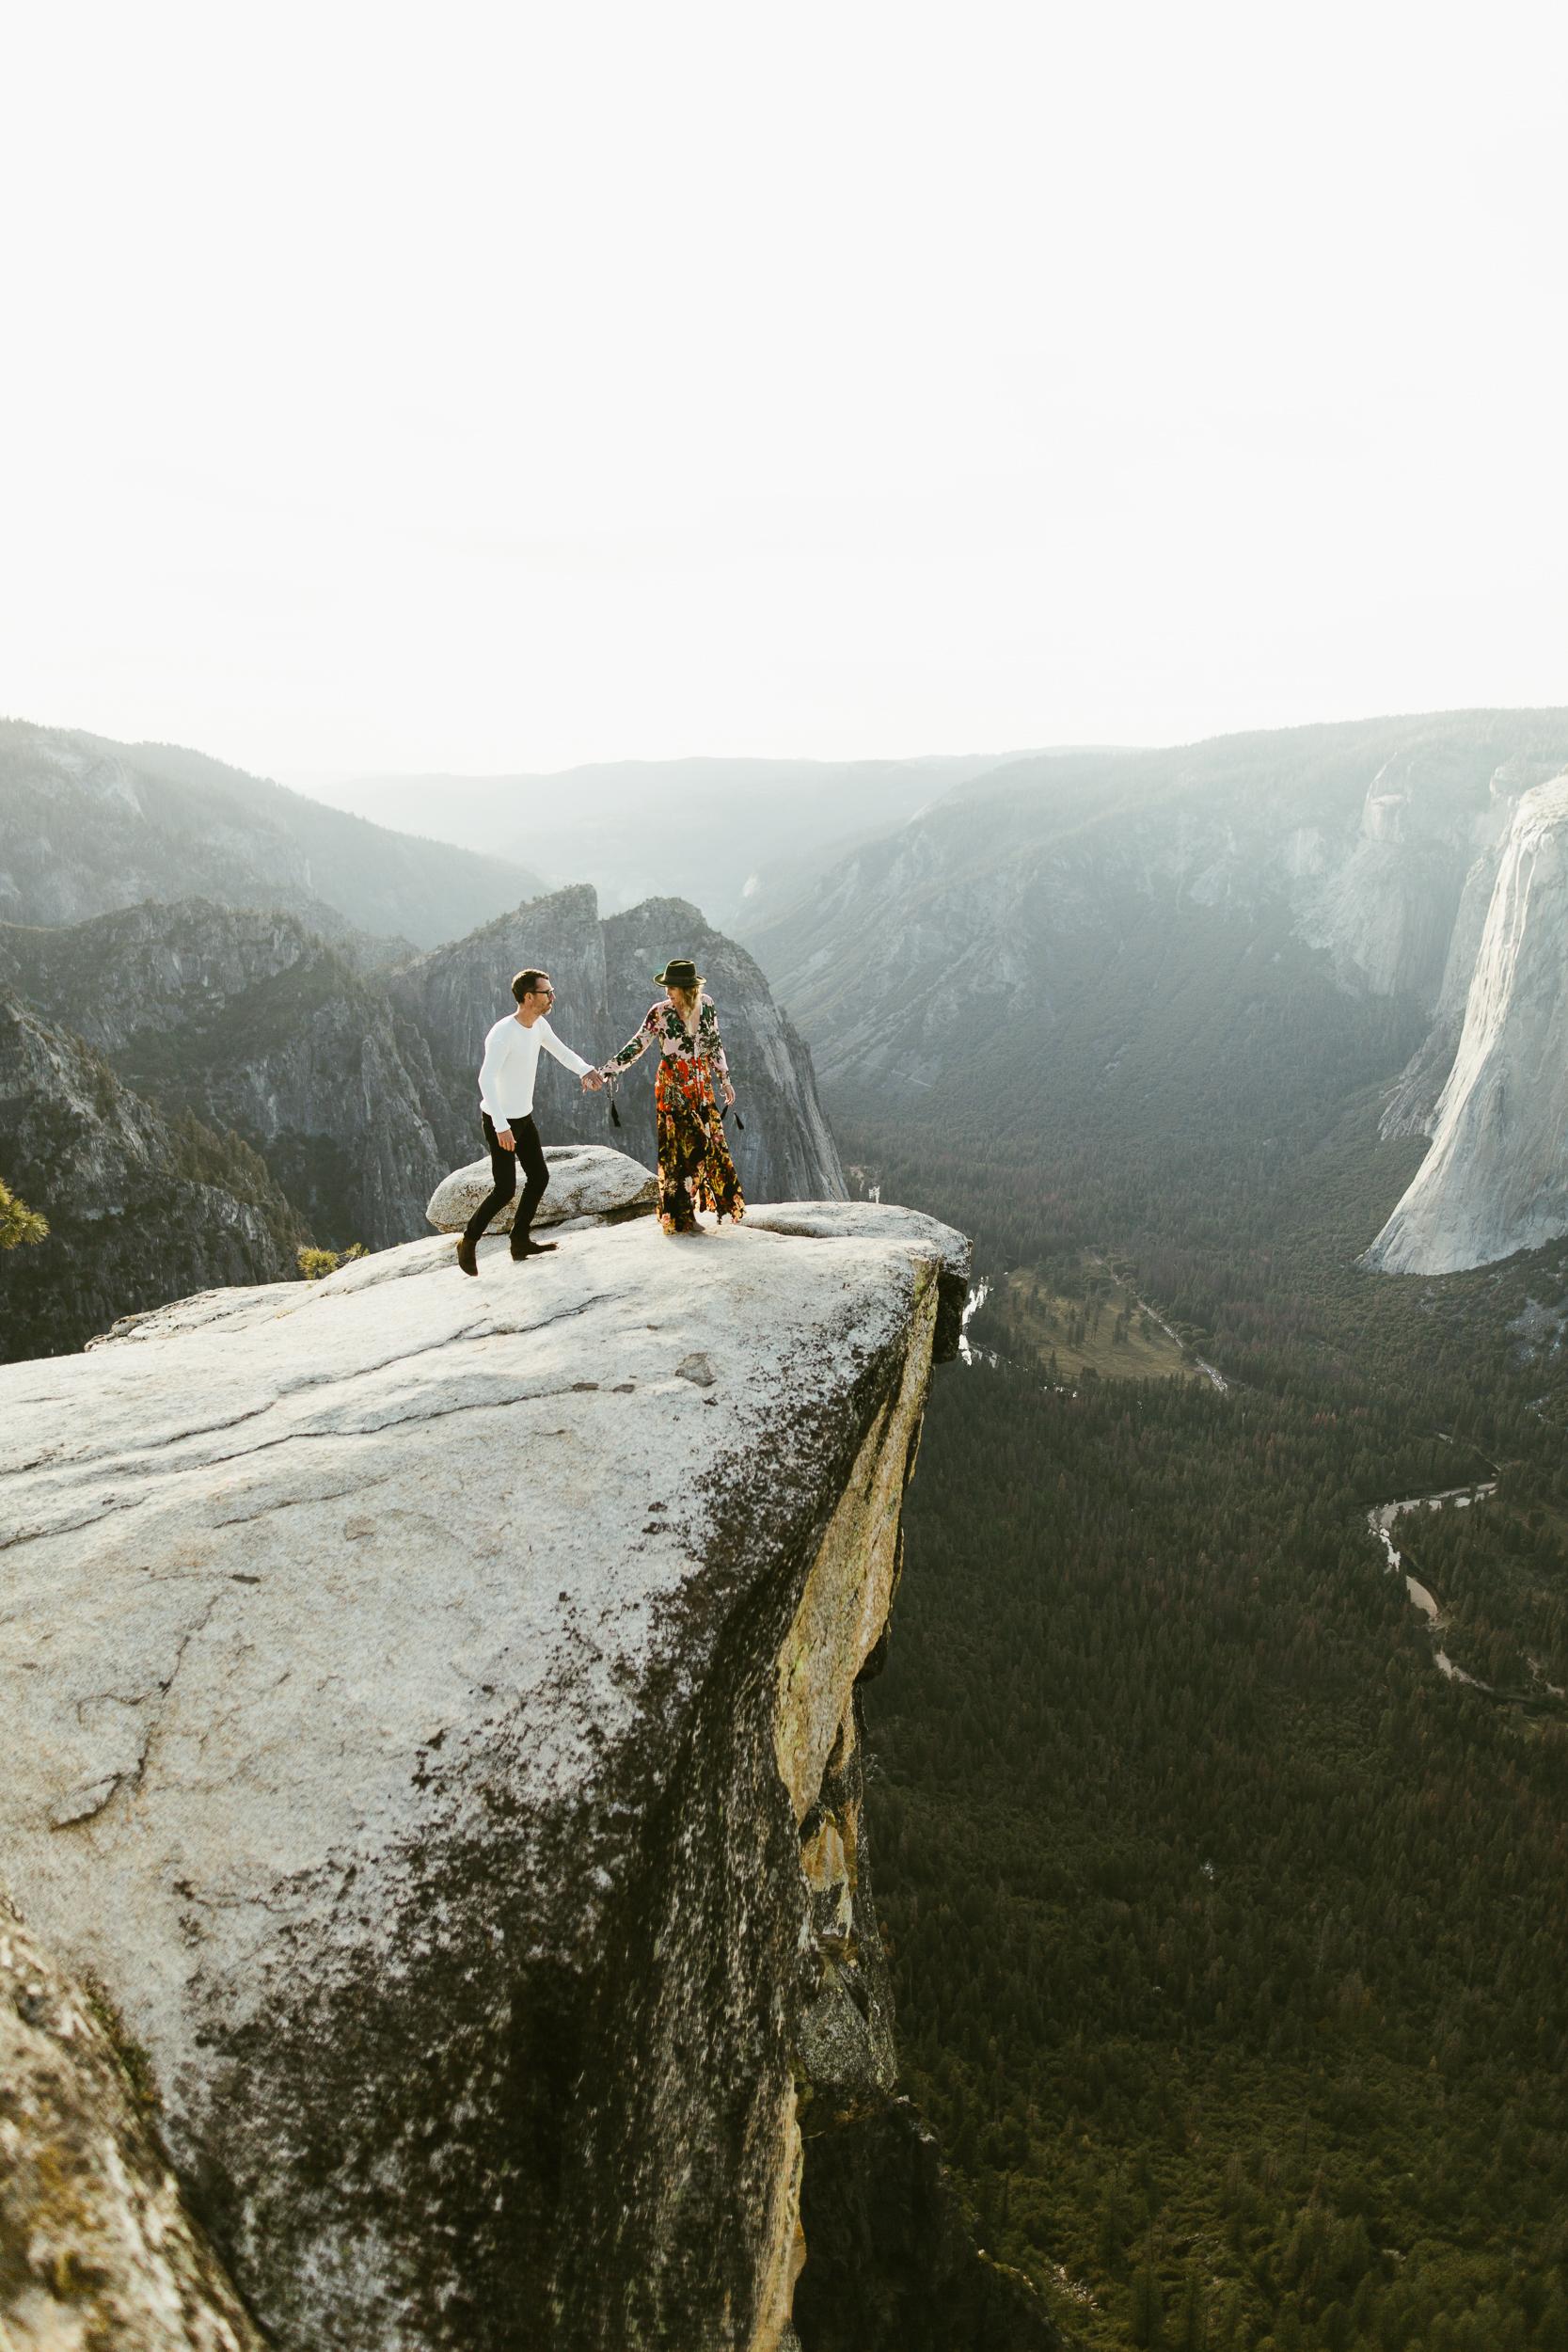 YosemiteElopementPhotographyJacquesFlynnLisaKarst09.jpg